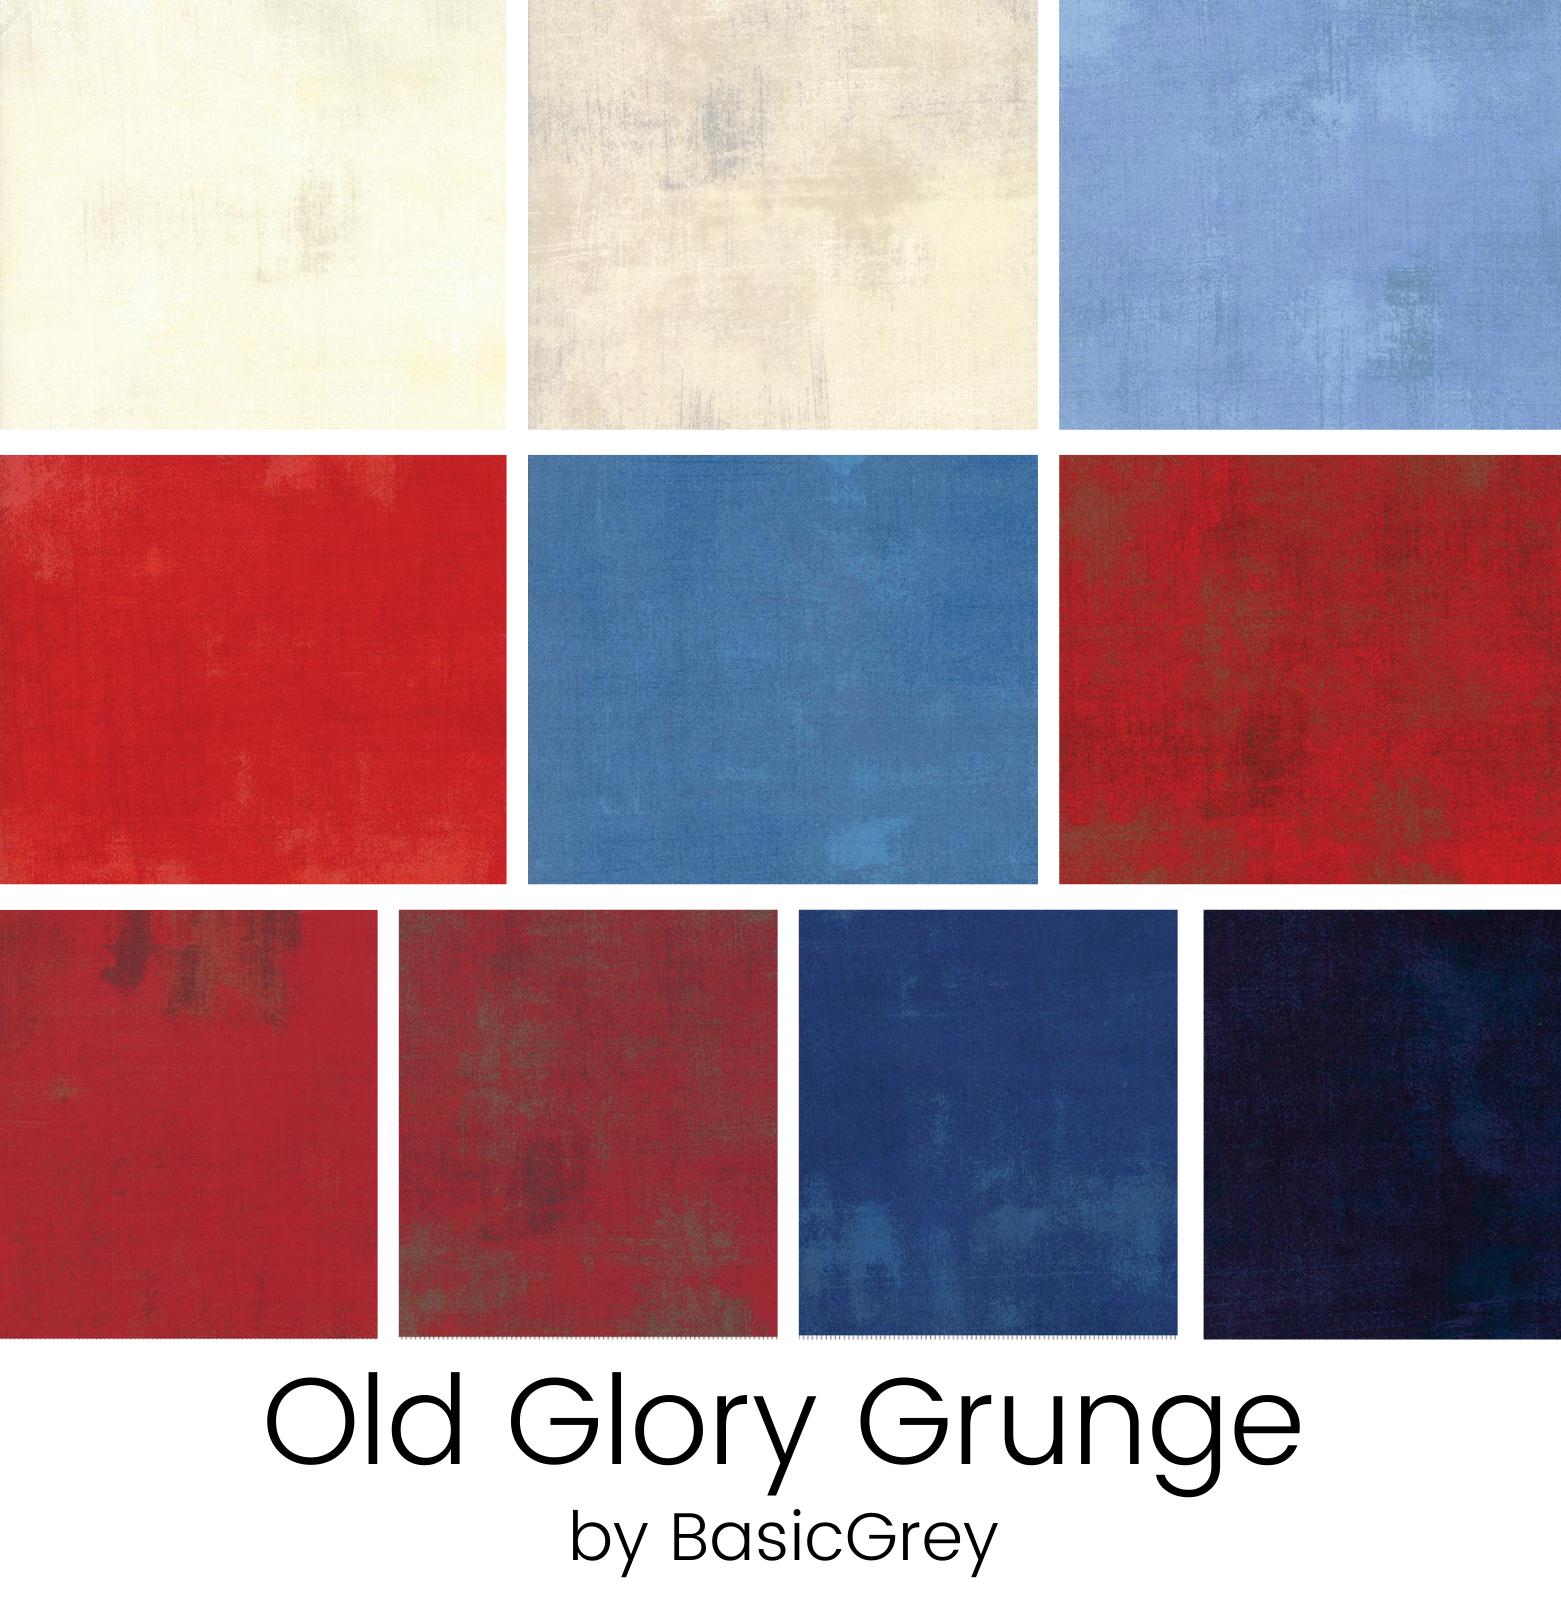 Grunge Old Glory Junior Jelly Roll® 20pcs